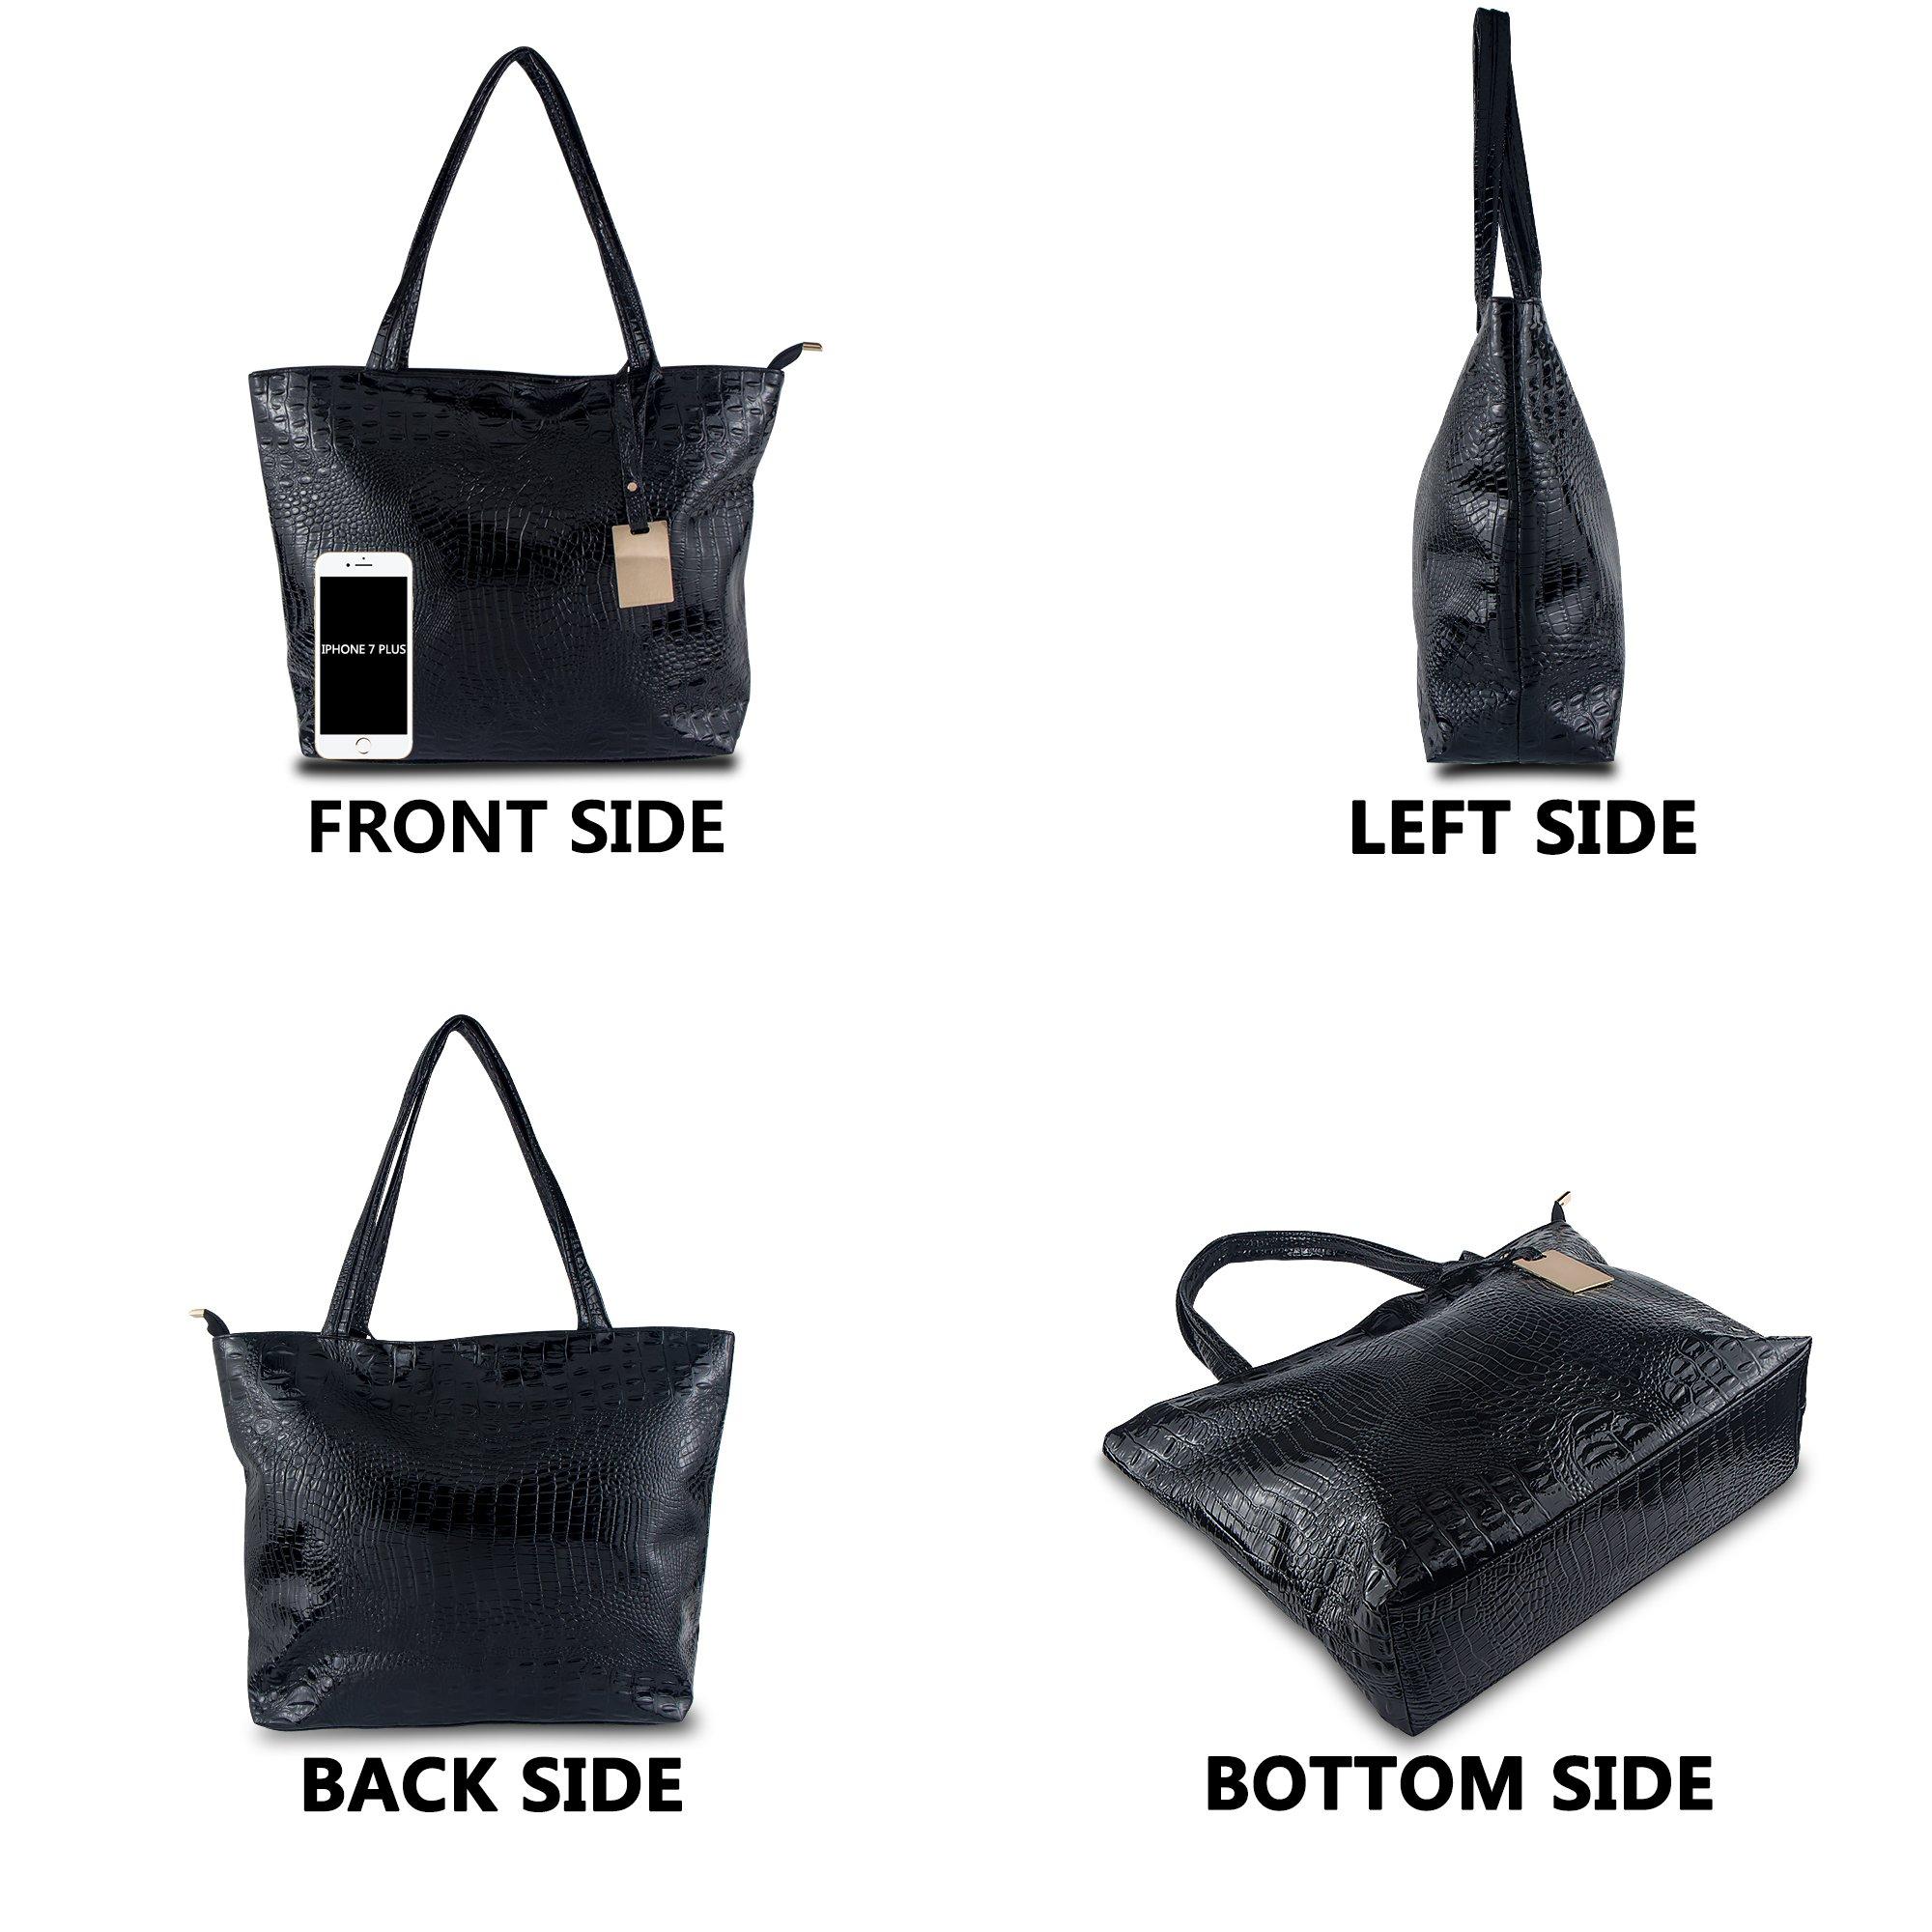 Bagood Womens Crocodile Pattern PU Leather Casual Shopping Handbags High Capacity Shoulder Ladies Soft Bag for Wedding Bridal Prom Party Black by Bagood (Image #3)